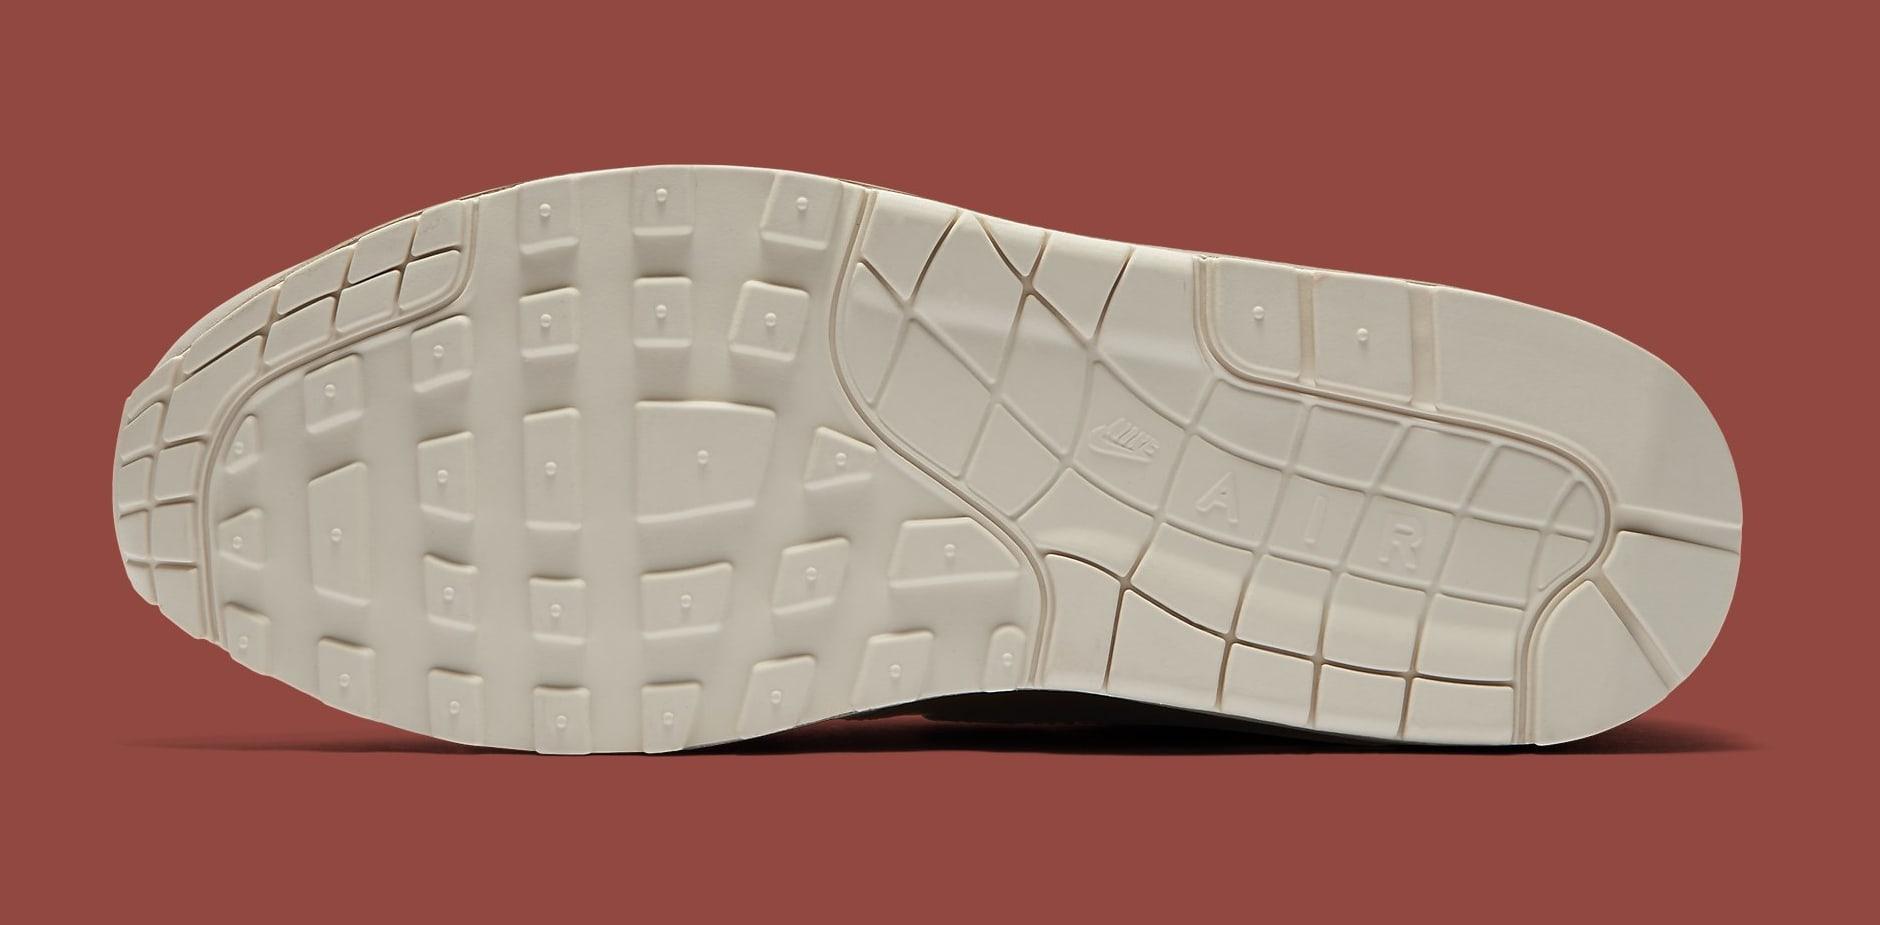 Nike Air Max 1 'City Pack' Amsterdam CV1638-200 Outsole